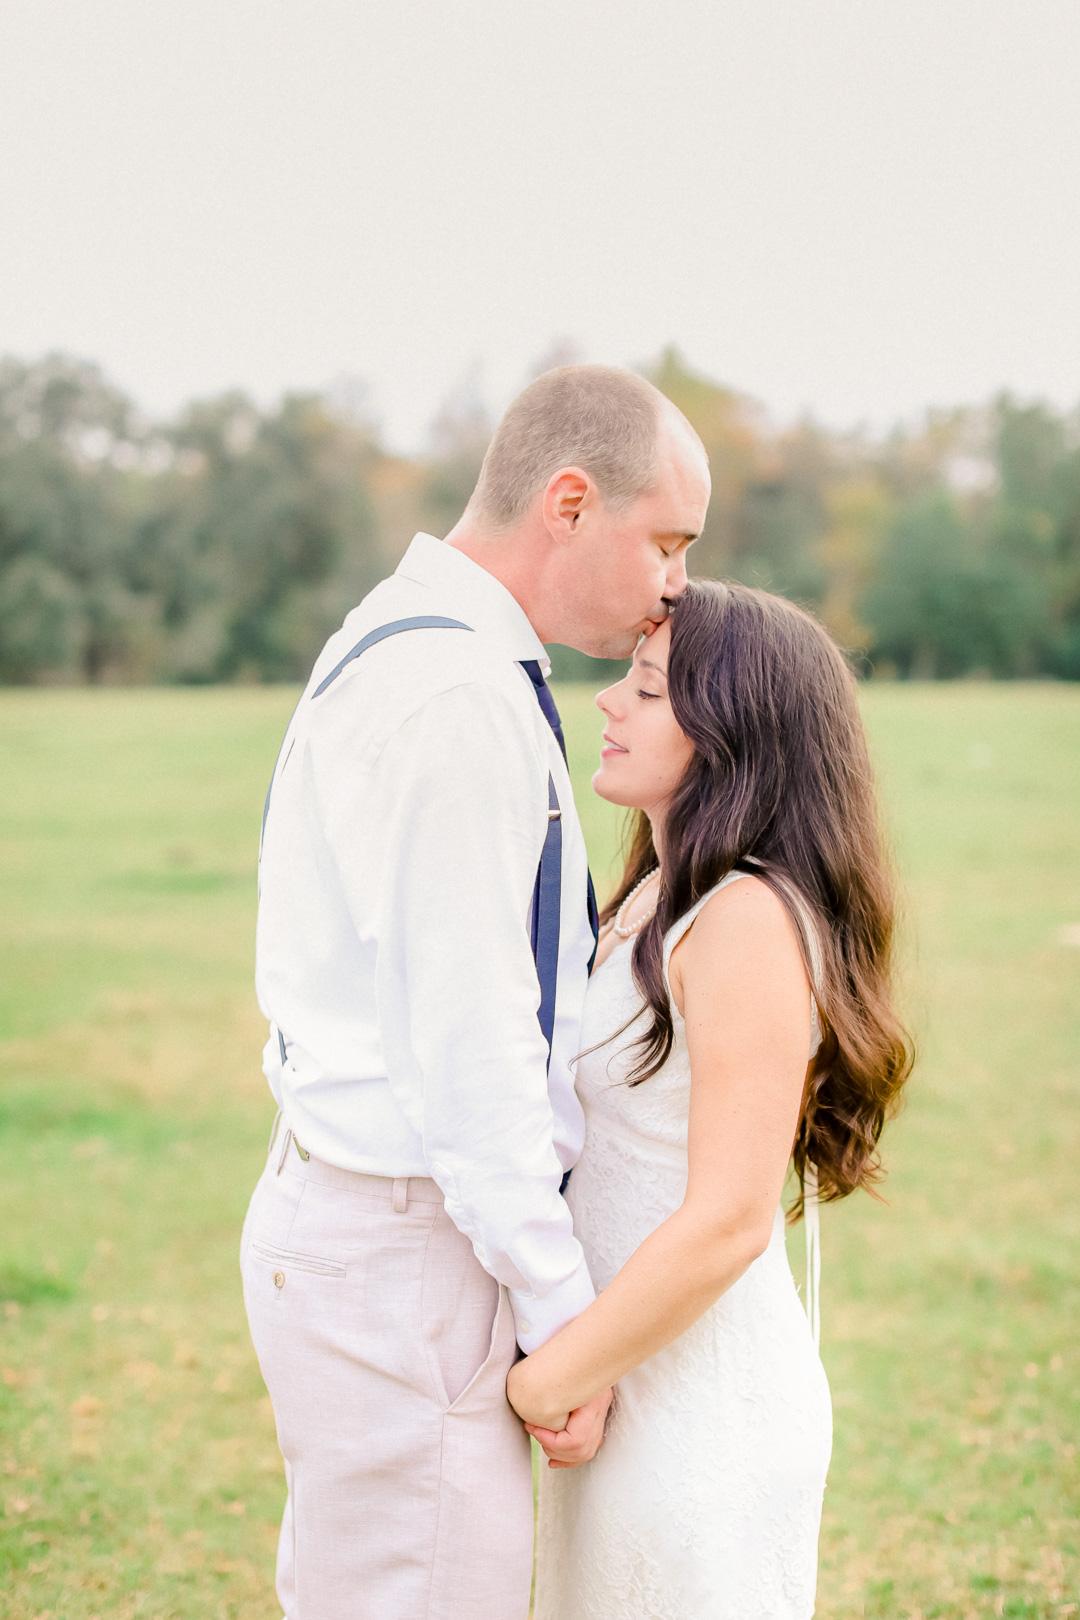 williams_family_newlywed-151.jpg